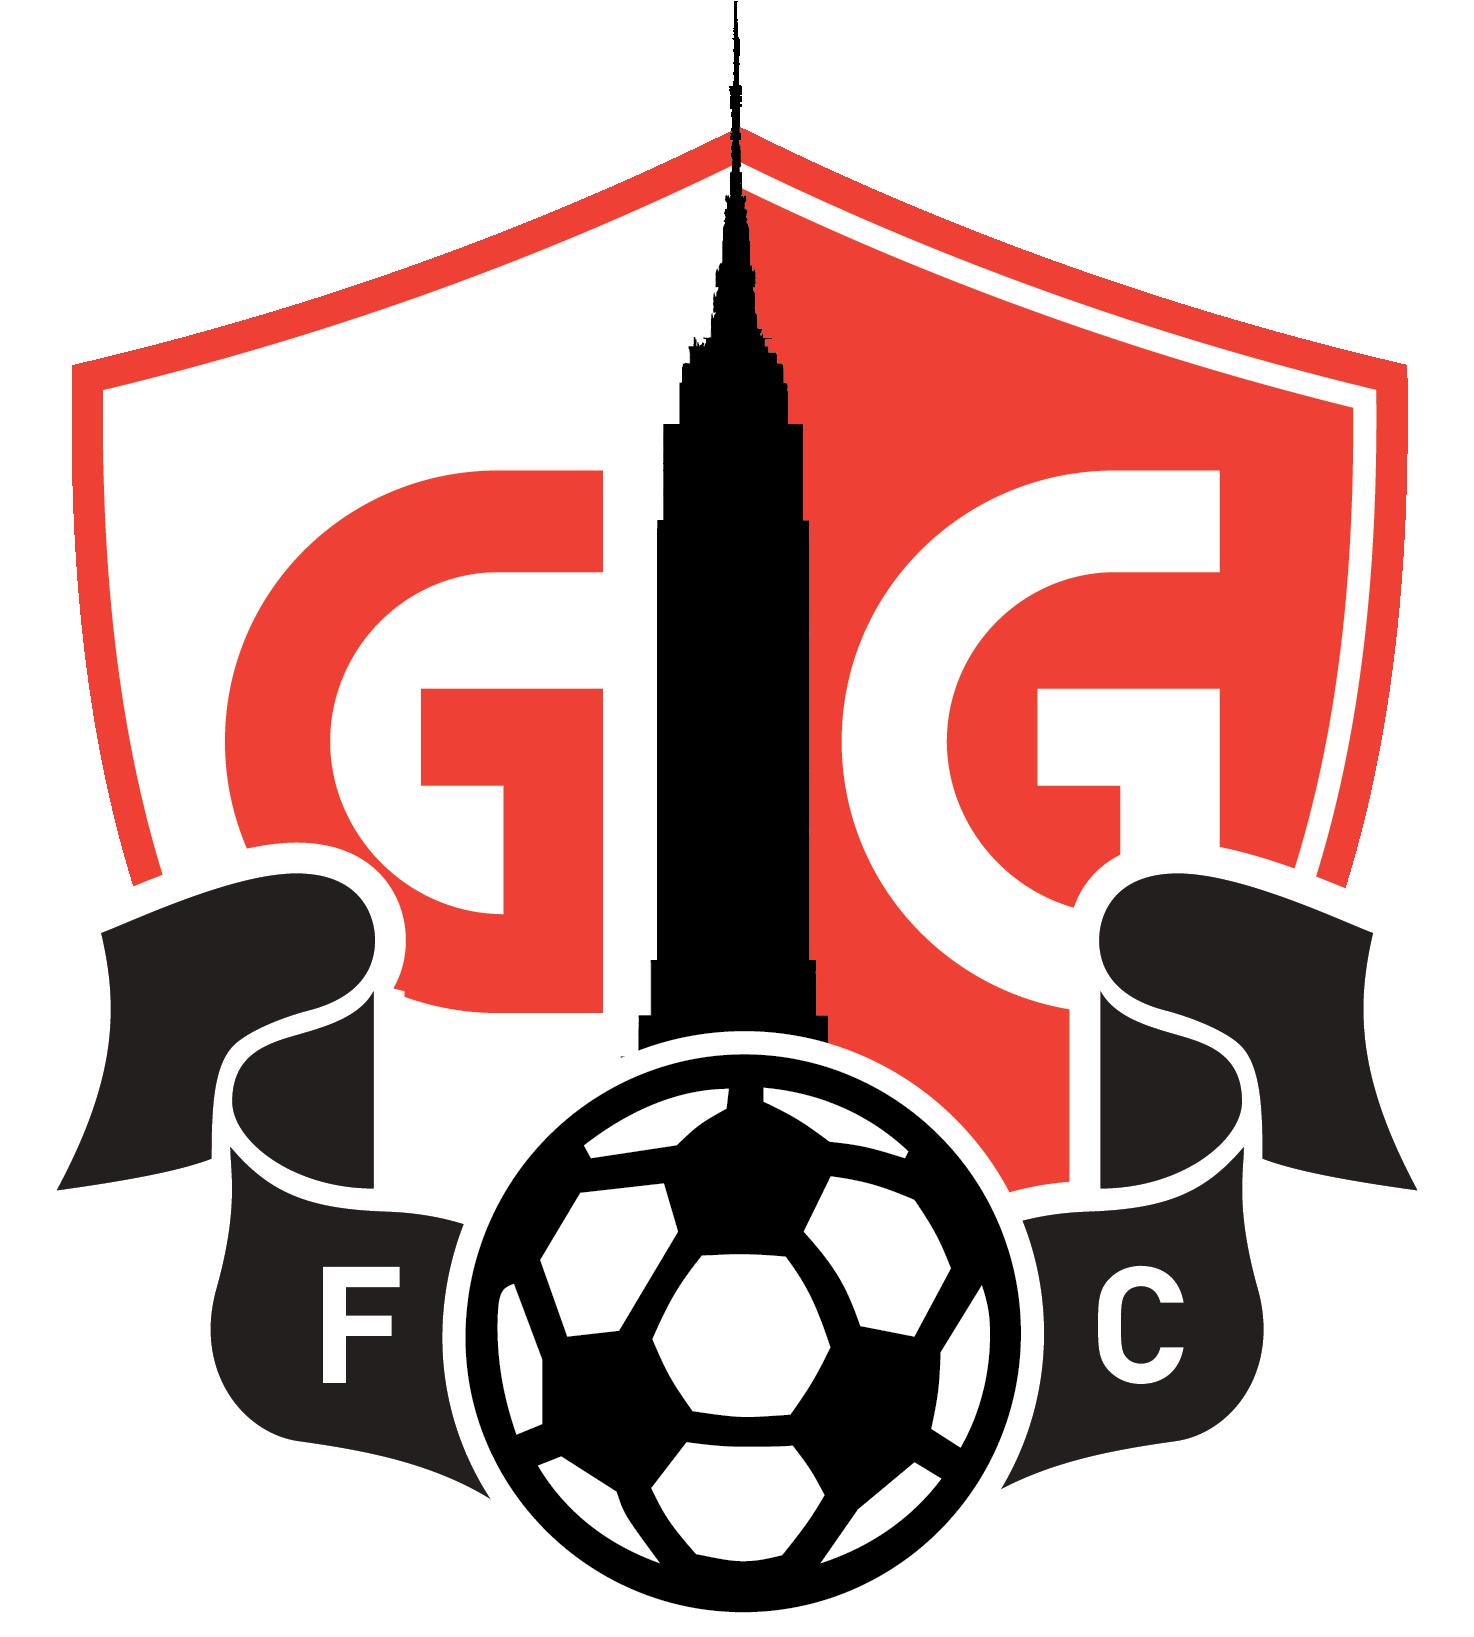 GGFC(2color)_rev-02